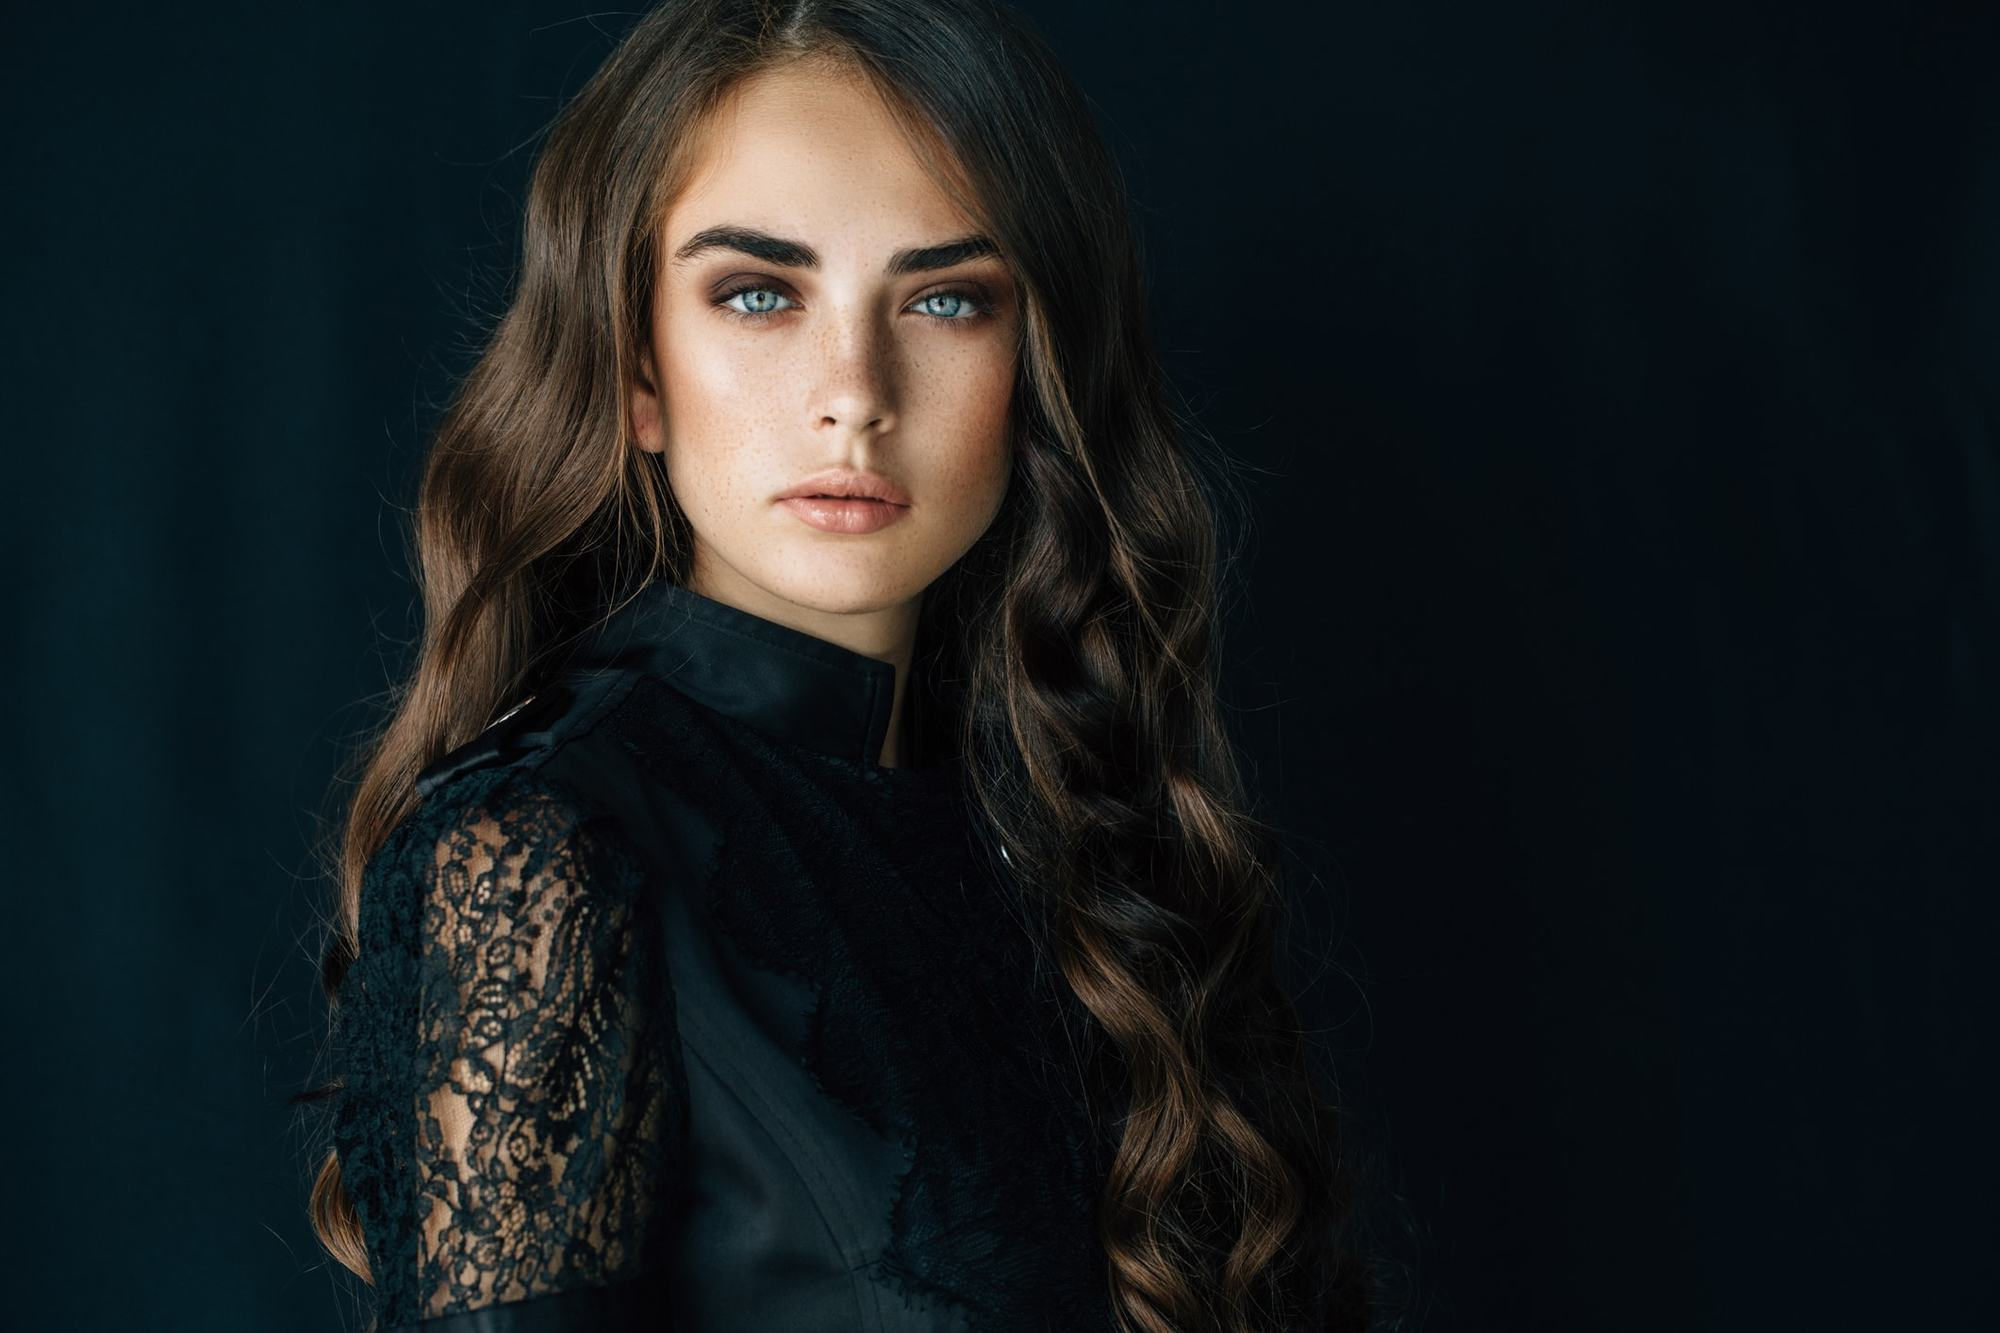 hairstyles for long brown hair curls